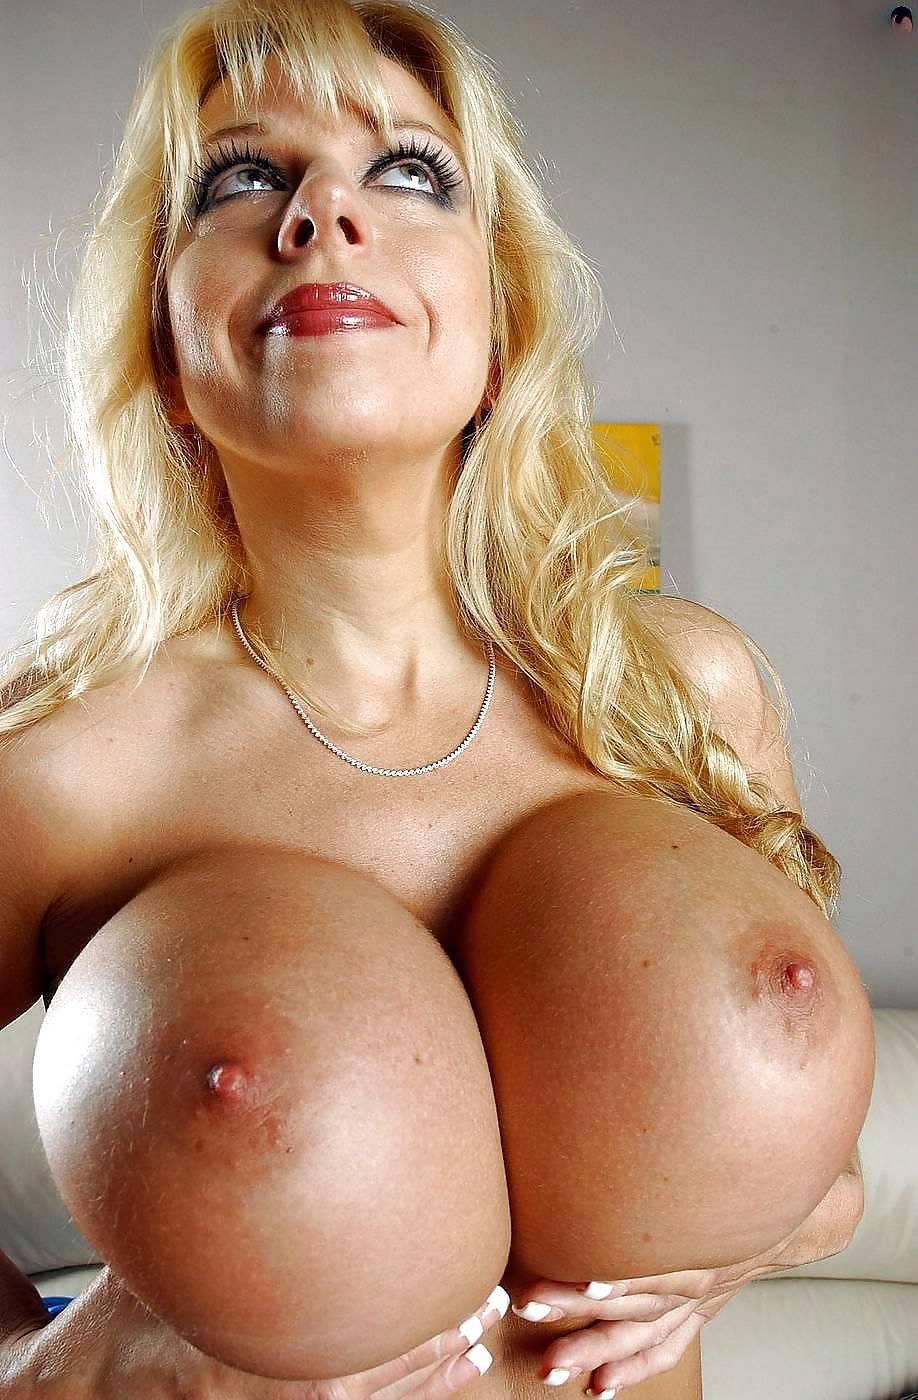 София росси фото галереи сперма на груди — photo 4